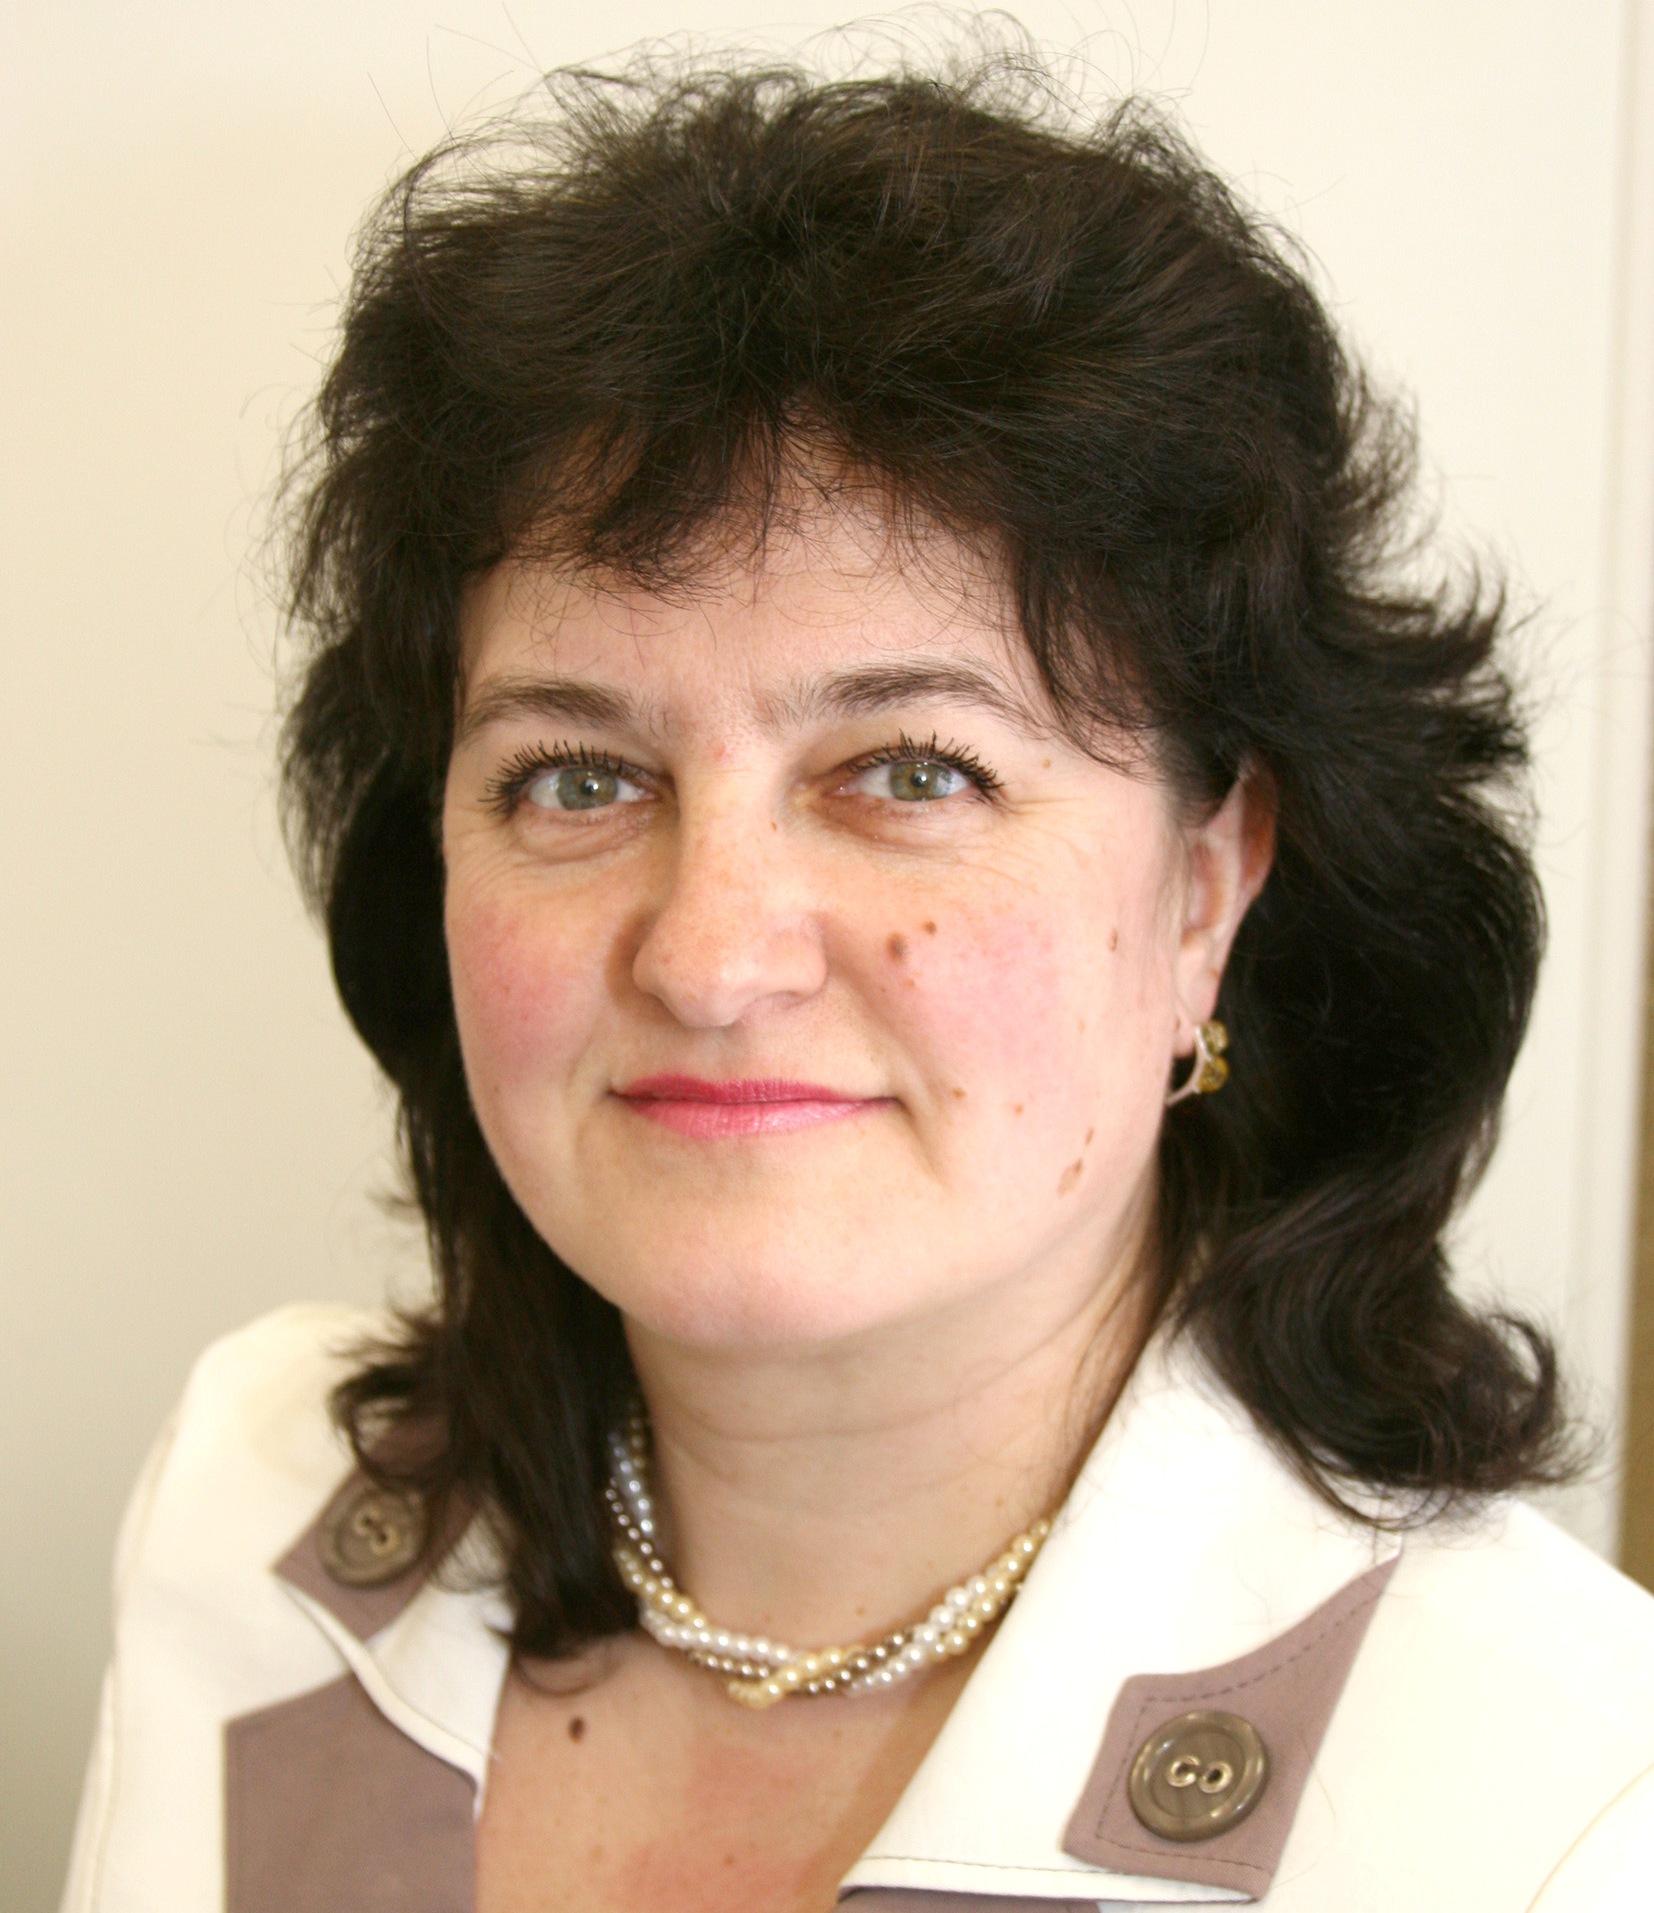 Зайцева Нина Юрьевна